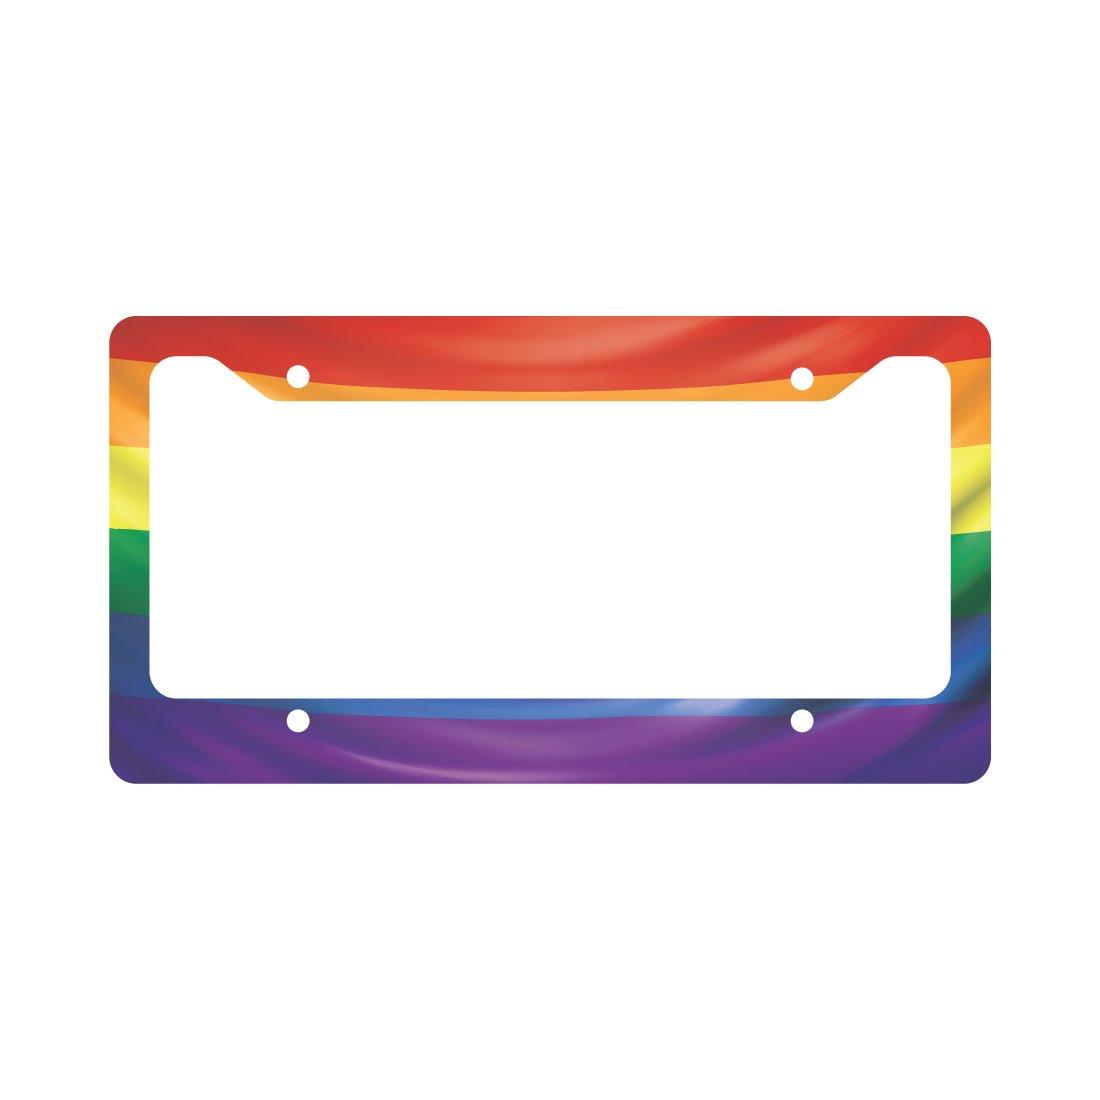 Gay Pride Flagge Nummernschild Rahmen: Amazon.de: Küche & Haushalt